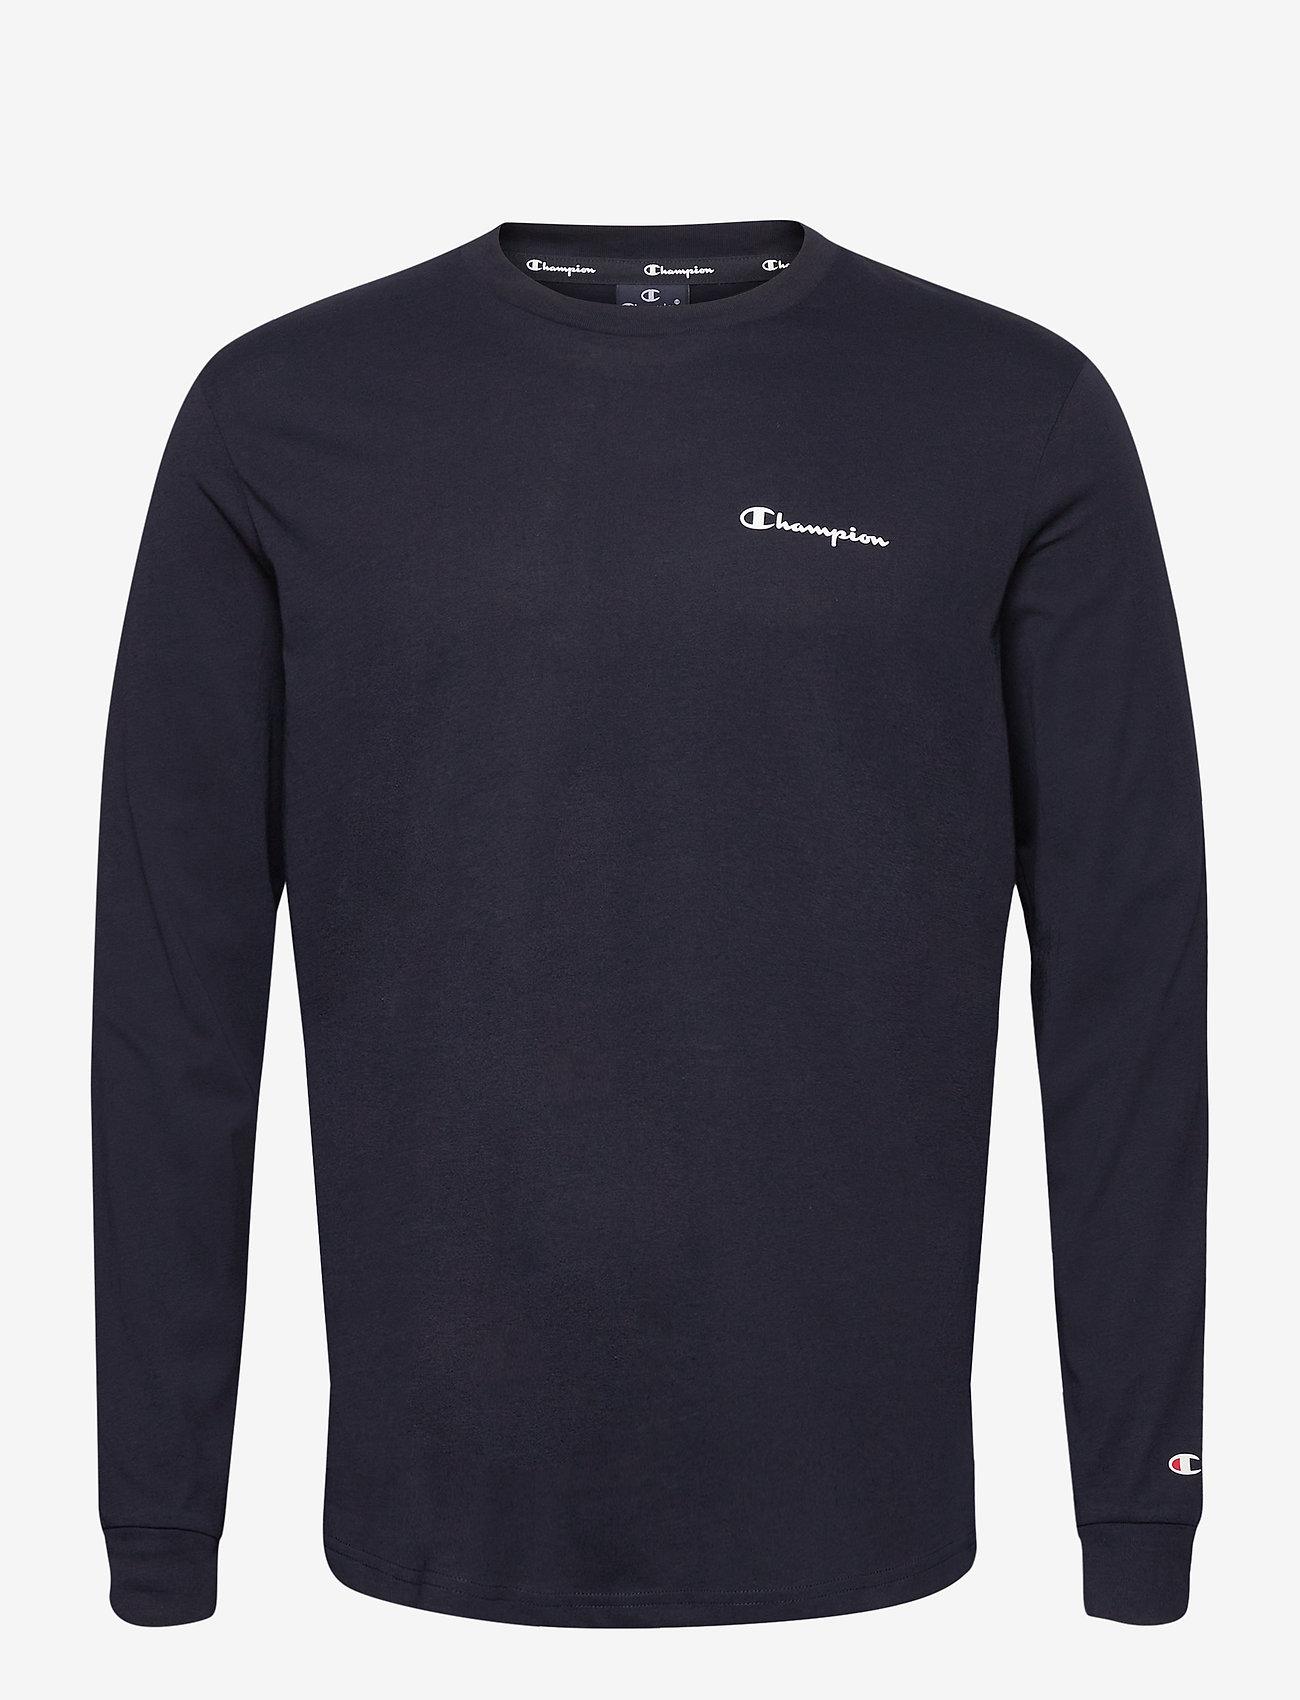 Long Sleeve Crewneck T Shirt